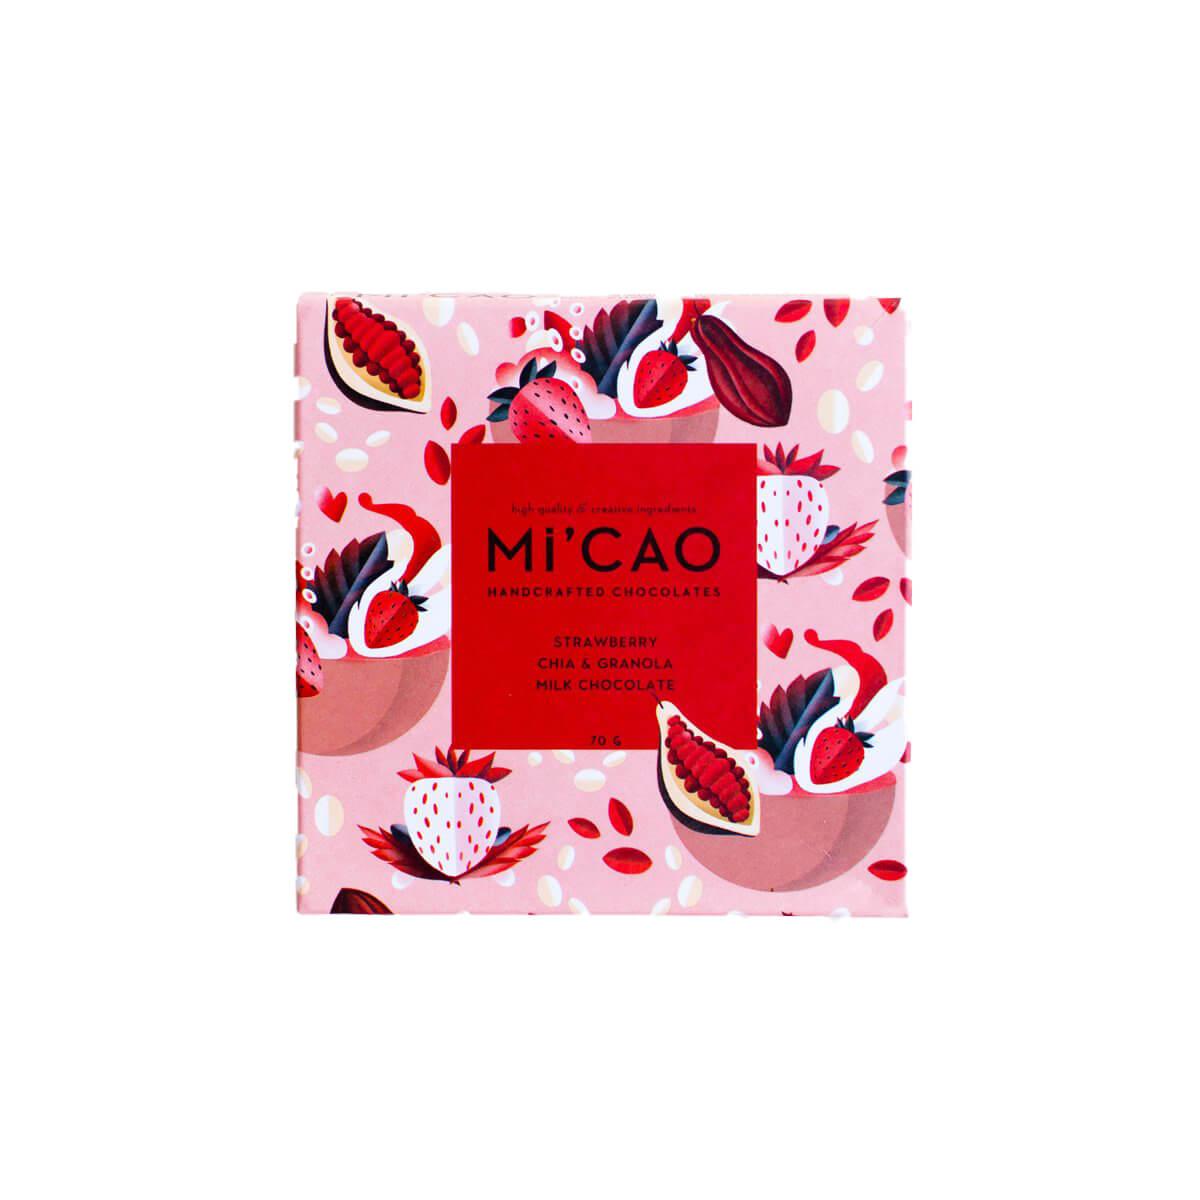 MI'Cao Çilekli Granolalı Sütlü Çikolata Tablet 70GR